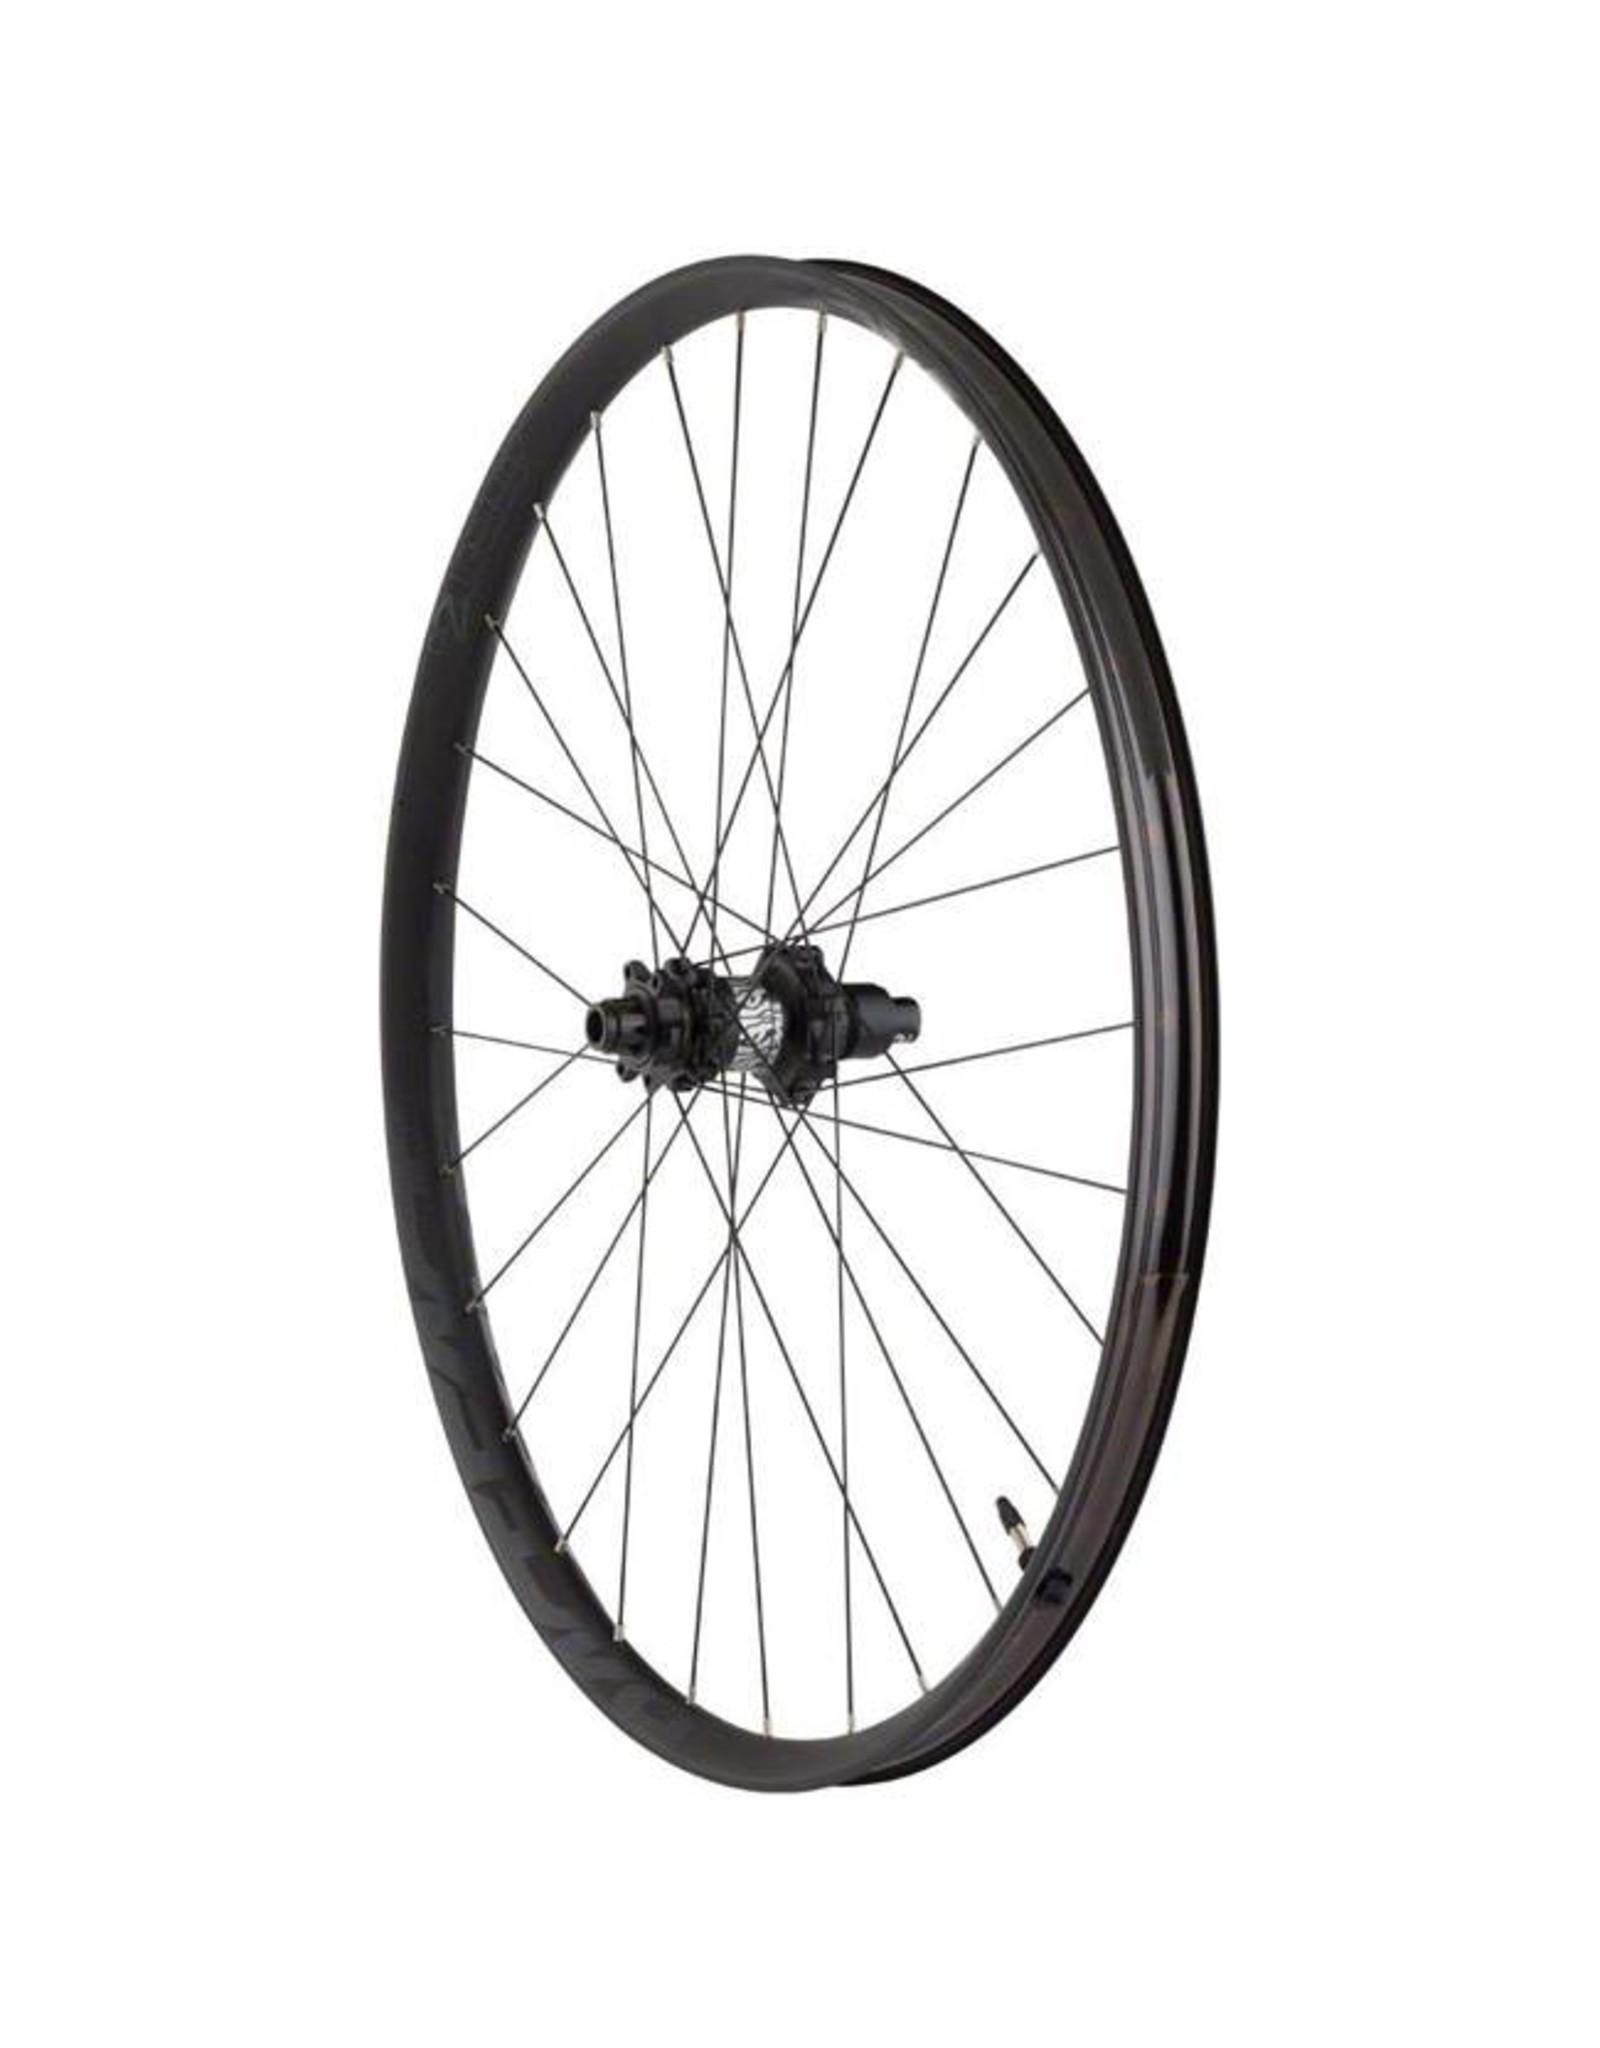 "RaceFace RaceFace Aeffect R Rear Wheel: 27.5"", Alloy Rim, 12 x 148mm Thru Axle, Shimano Freehub"